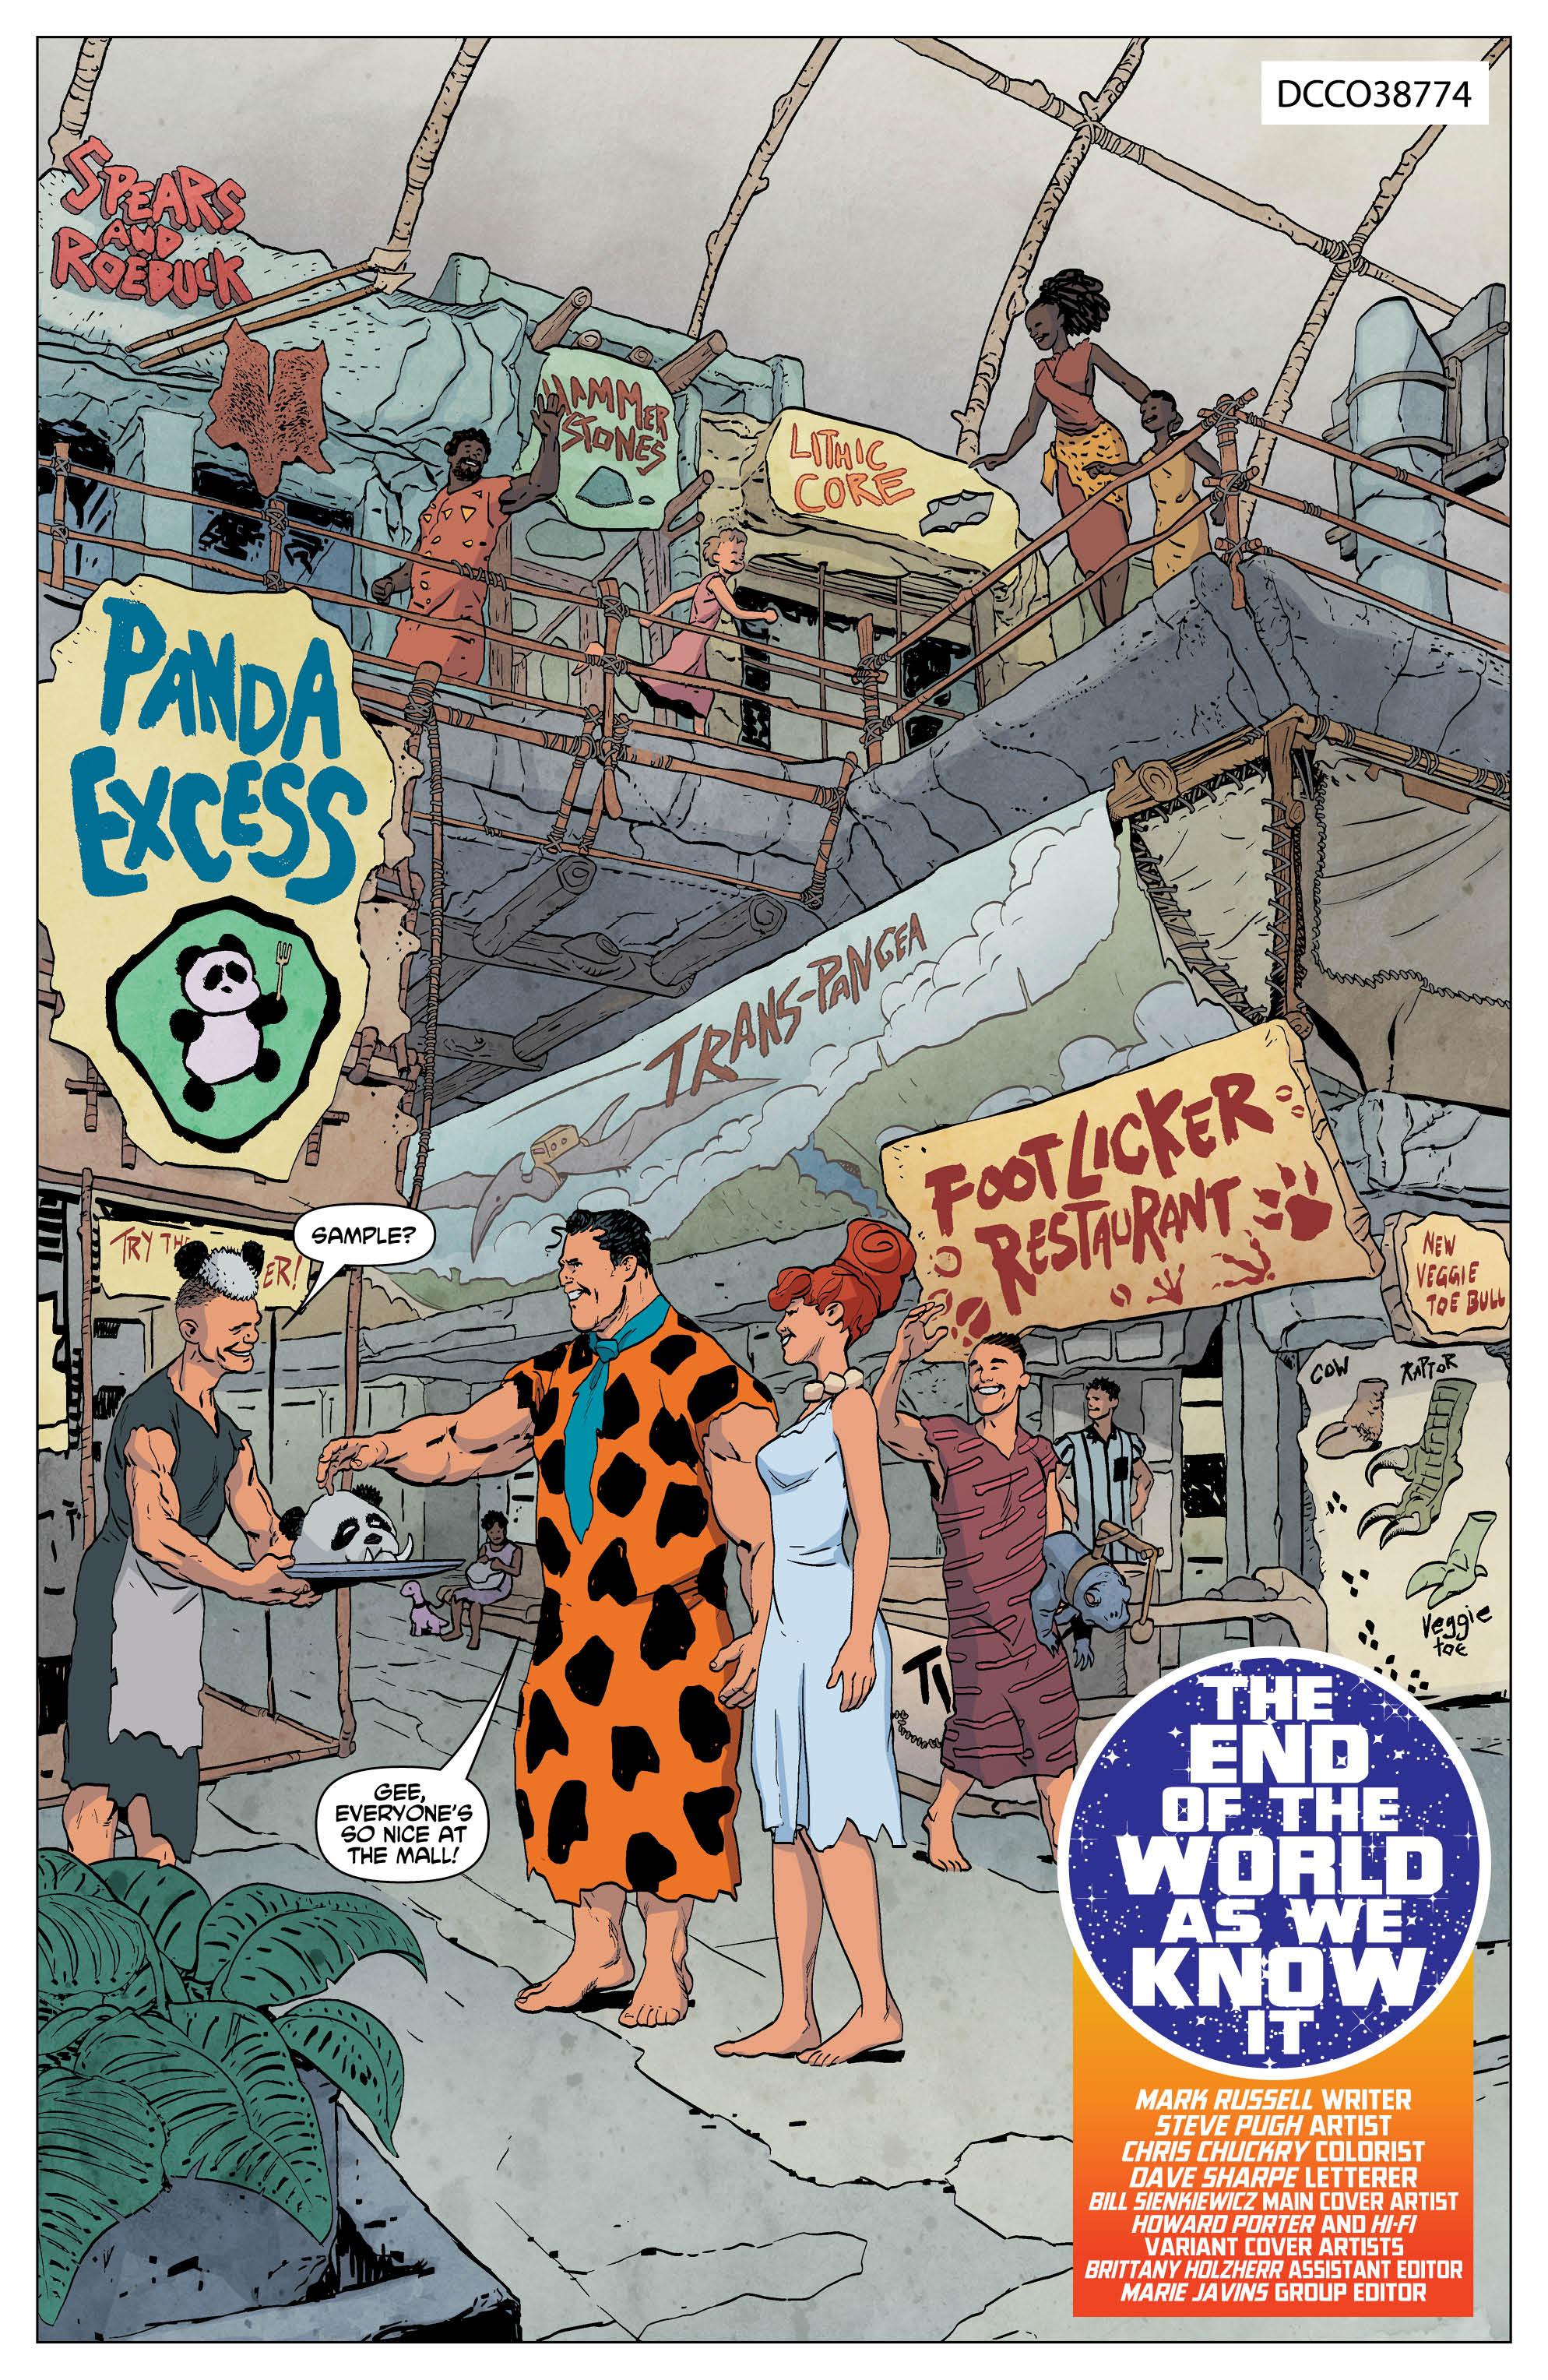 The Flintstones vol 1 review